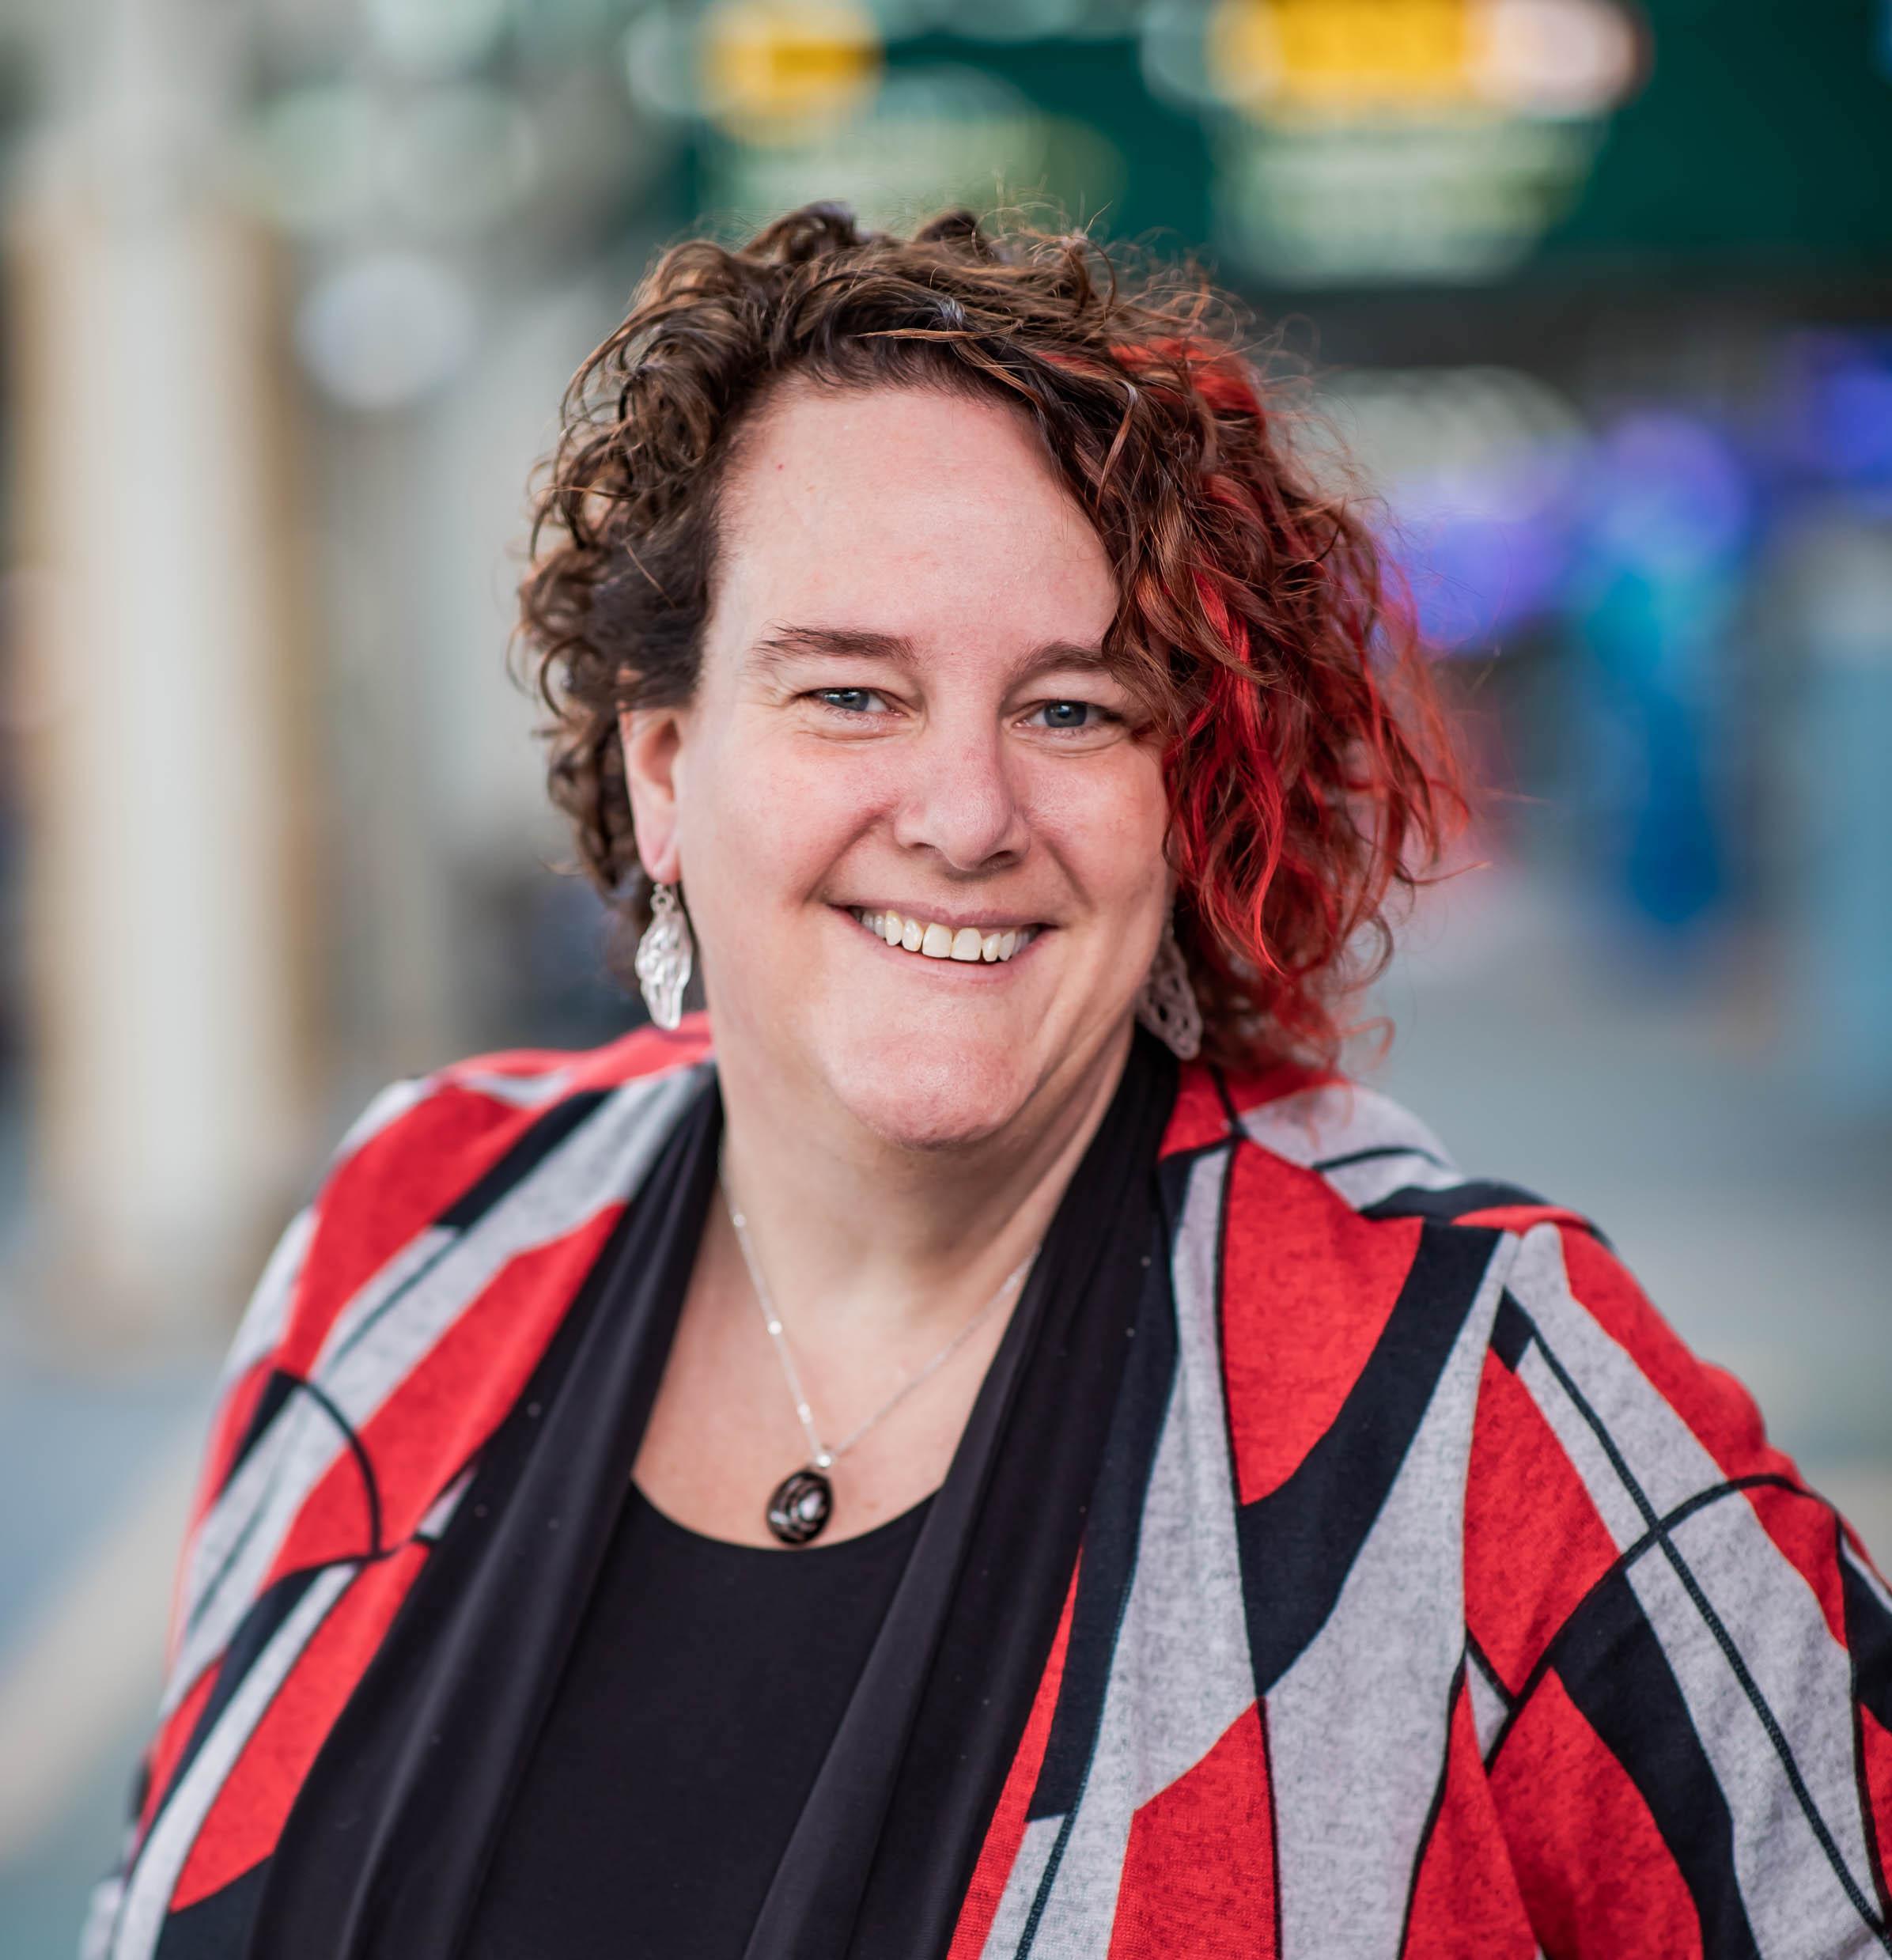 Wendy Avis, speaker at Impact 2020